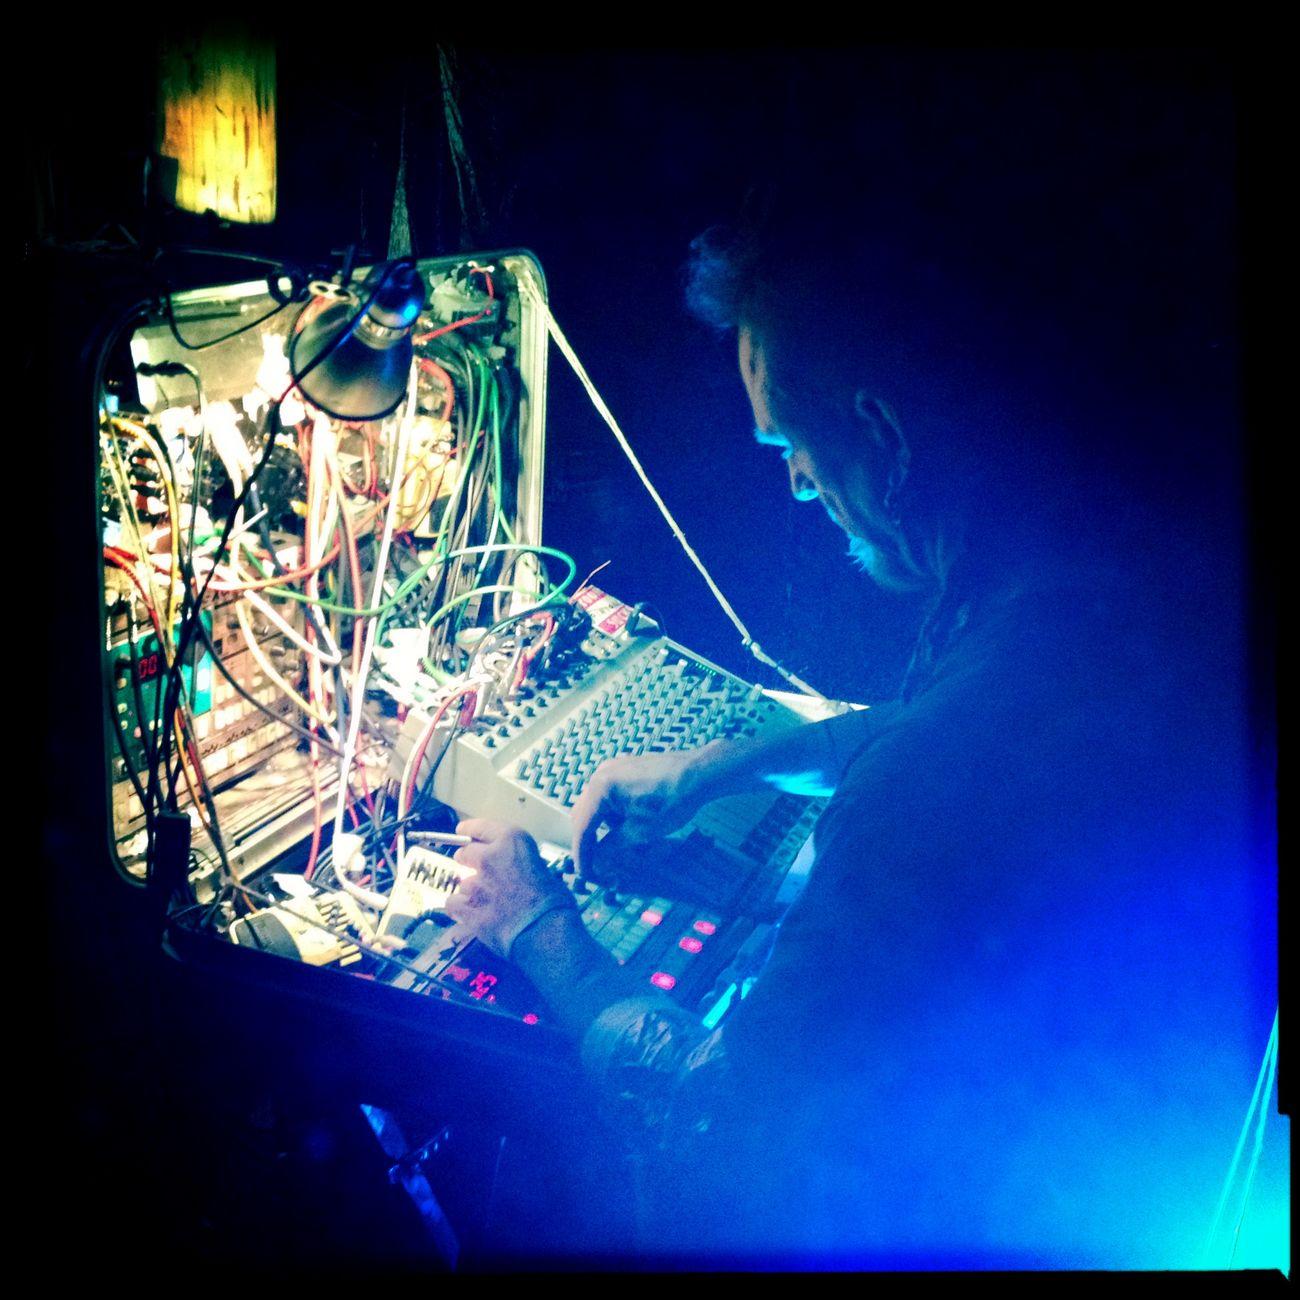 Electronic Music Shots Blue IPhoneography Urban Enjoying Life Music Hipstamatic